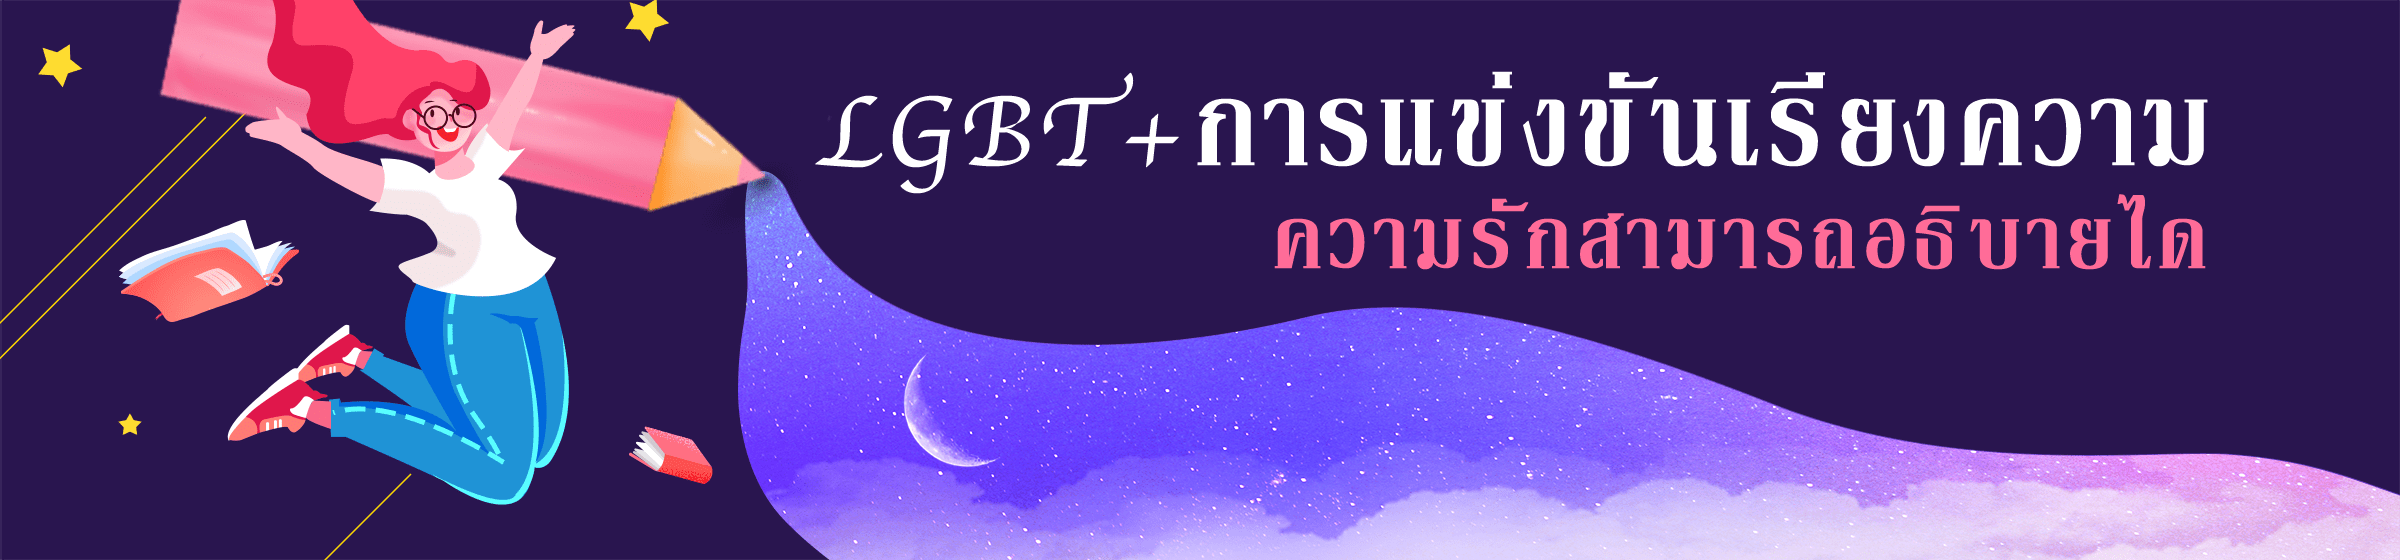 LGBT+ ประกวดงานเขียน@#29154f@#29154f